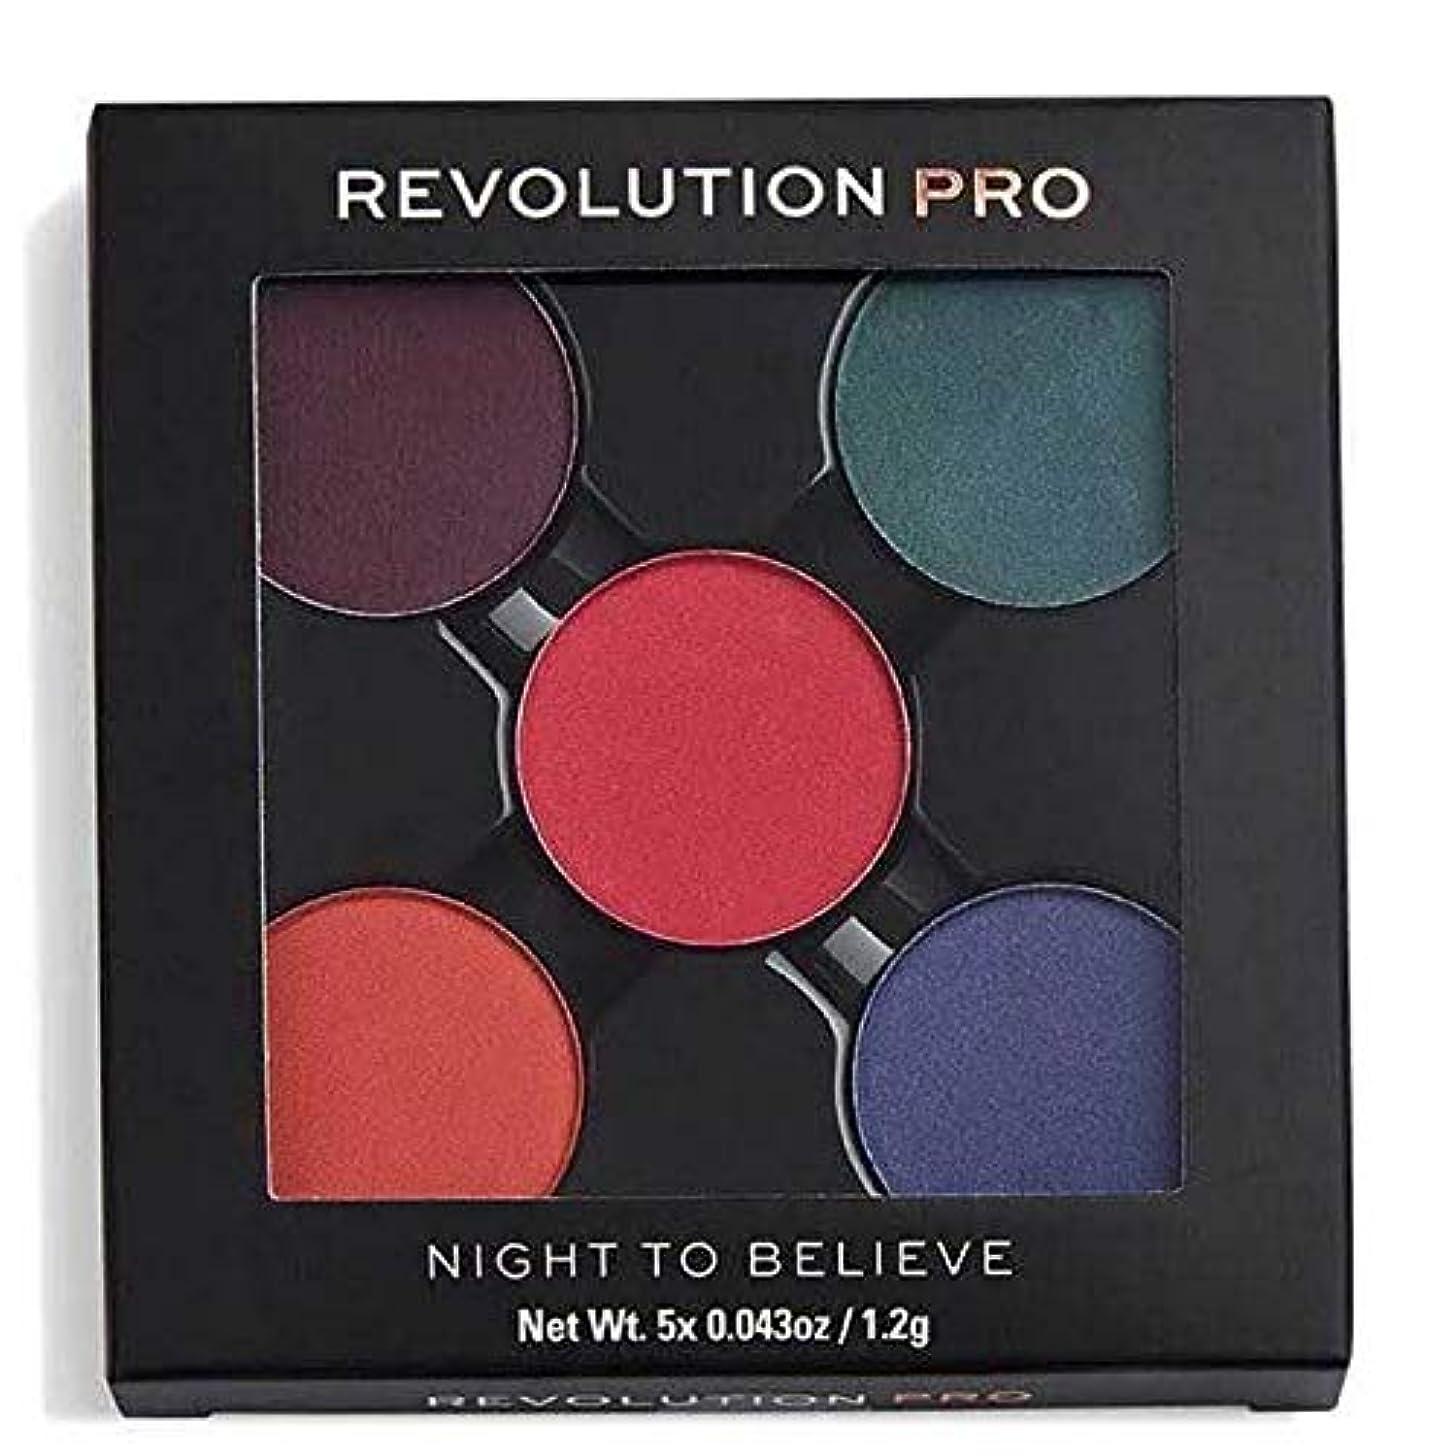 [Revolution ] 信じる革命プロリフィルアイシャドウパック夜 - Revolution Pro Refill Eyeshadow Pack Night To Believe [並行輸入品]